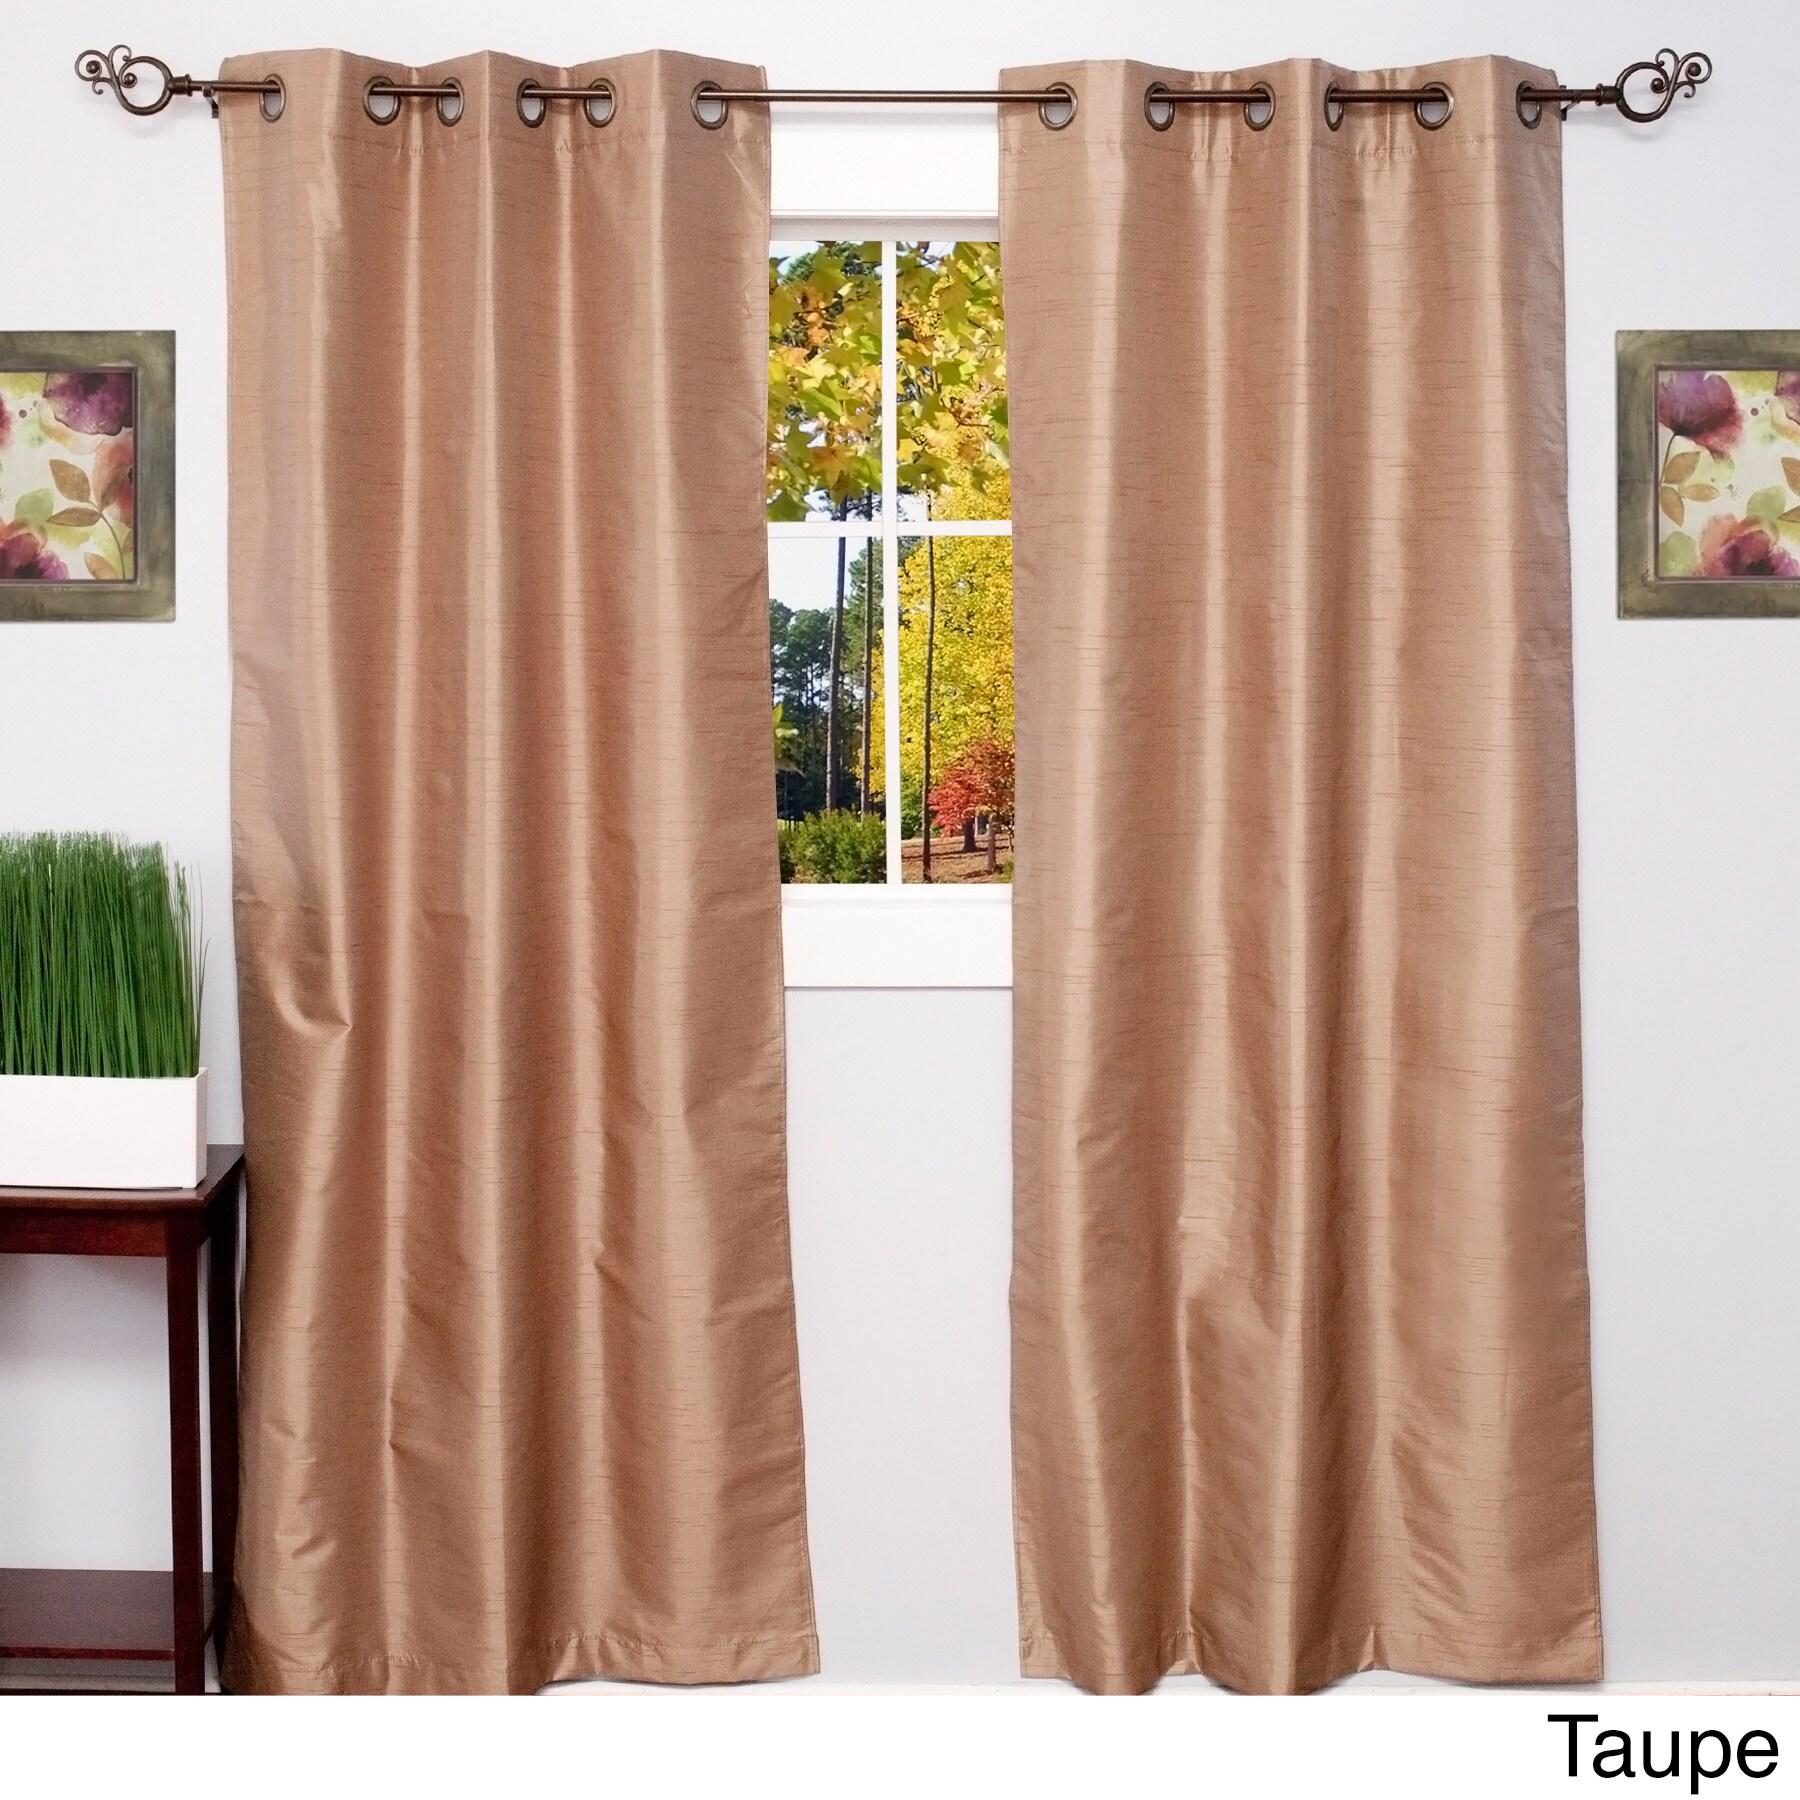 Thermal Blackout Grommet Top Curtain Panel Pair